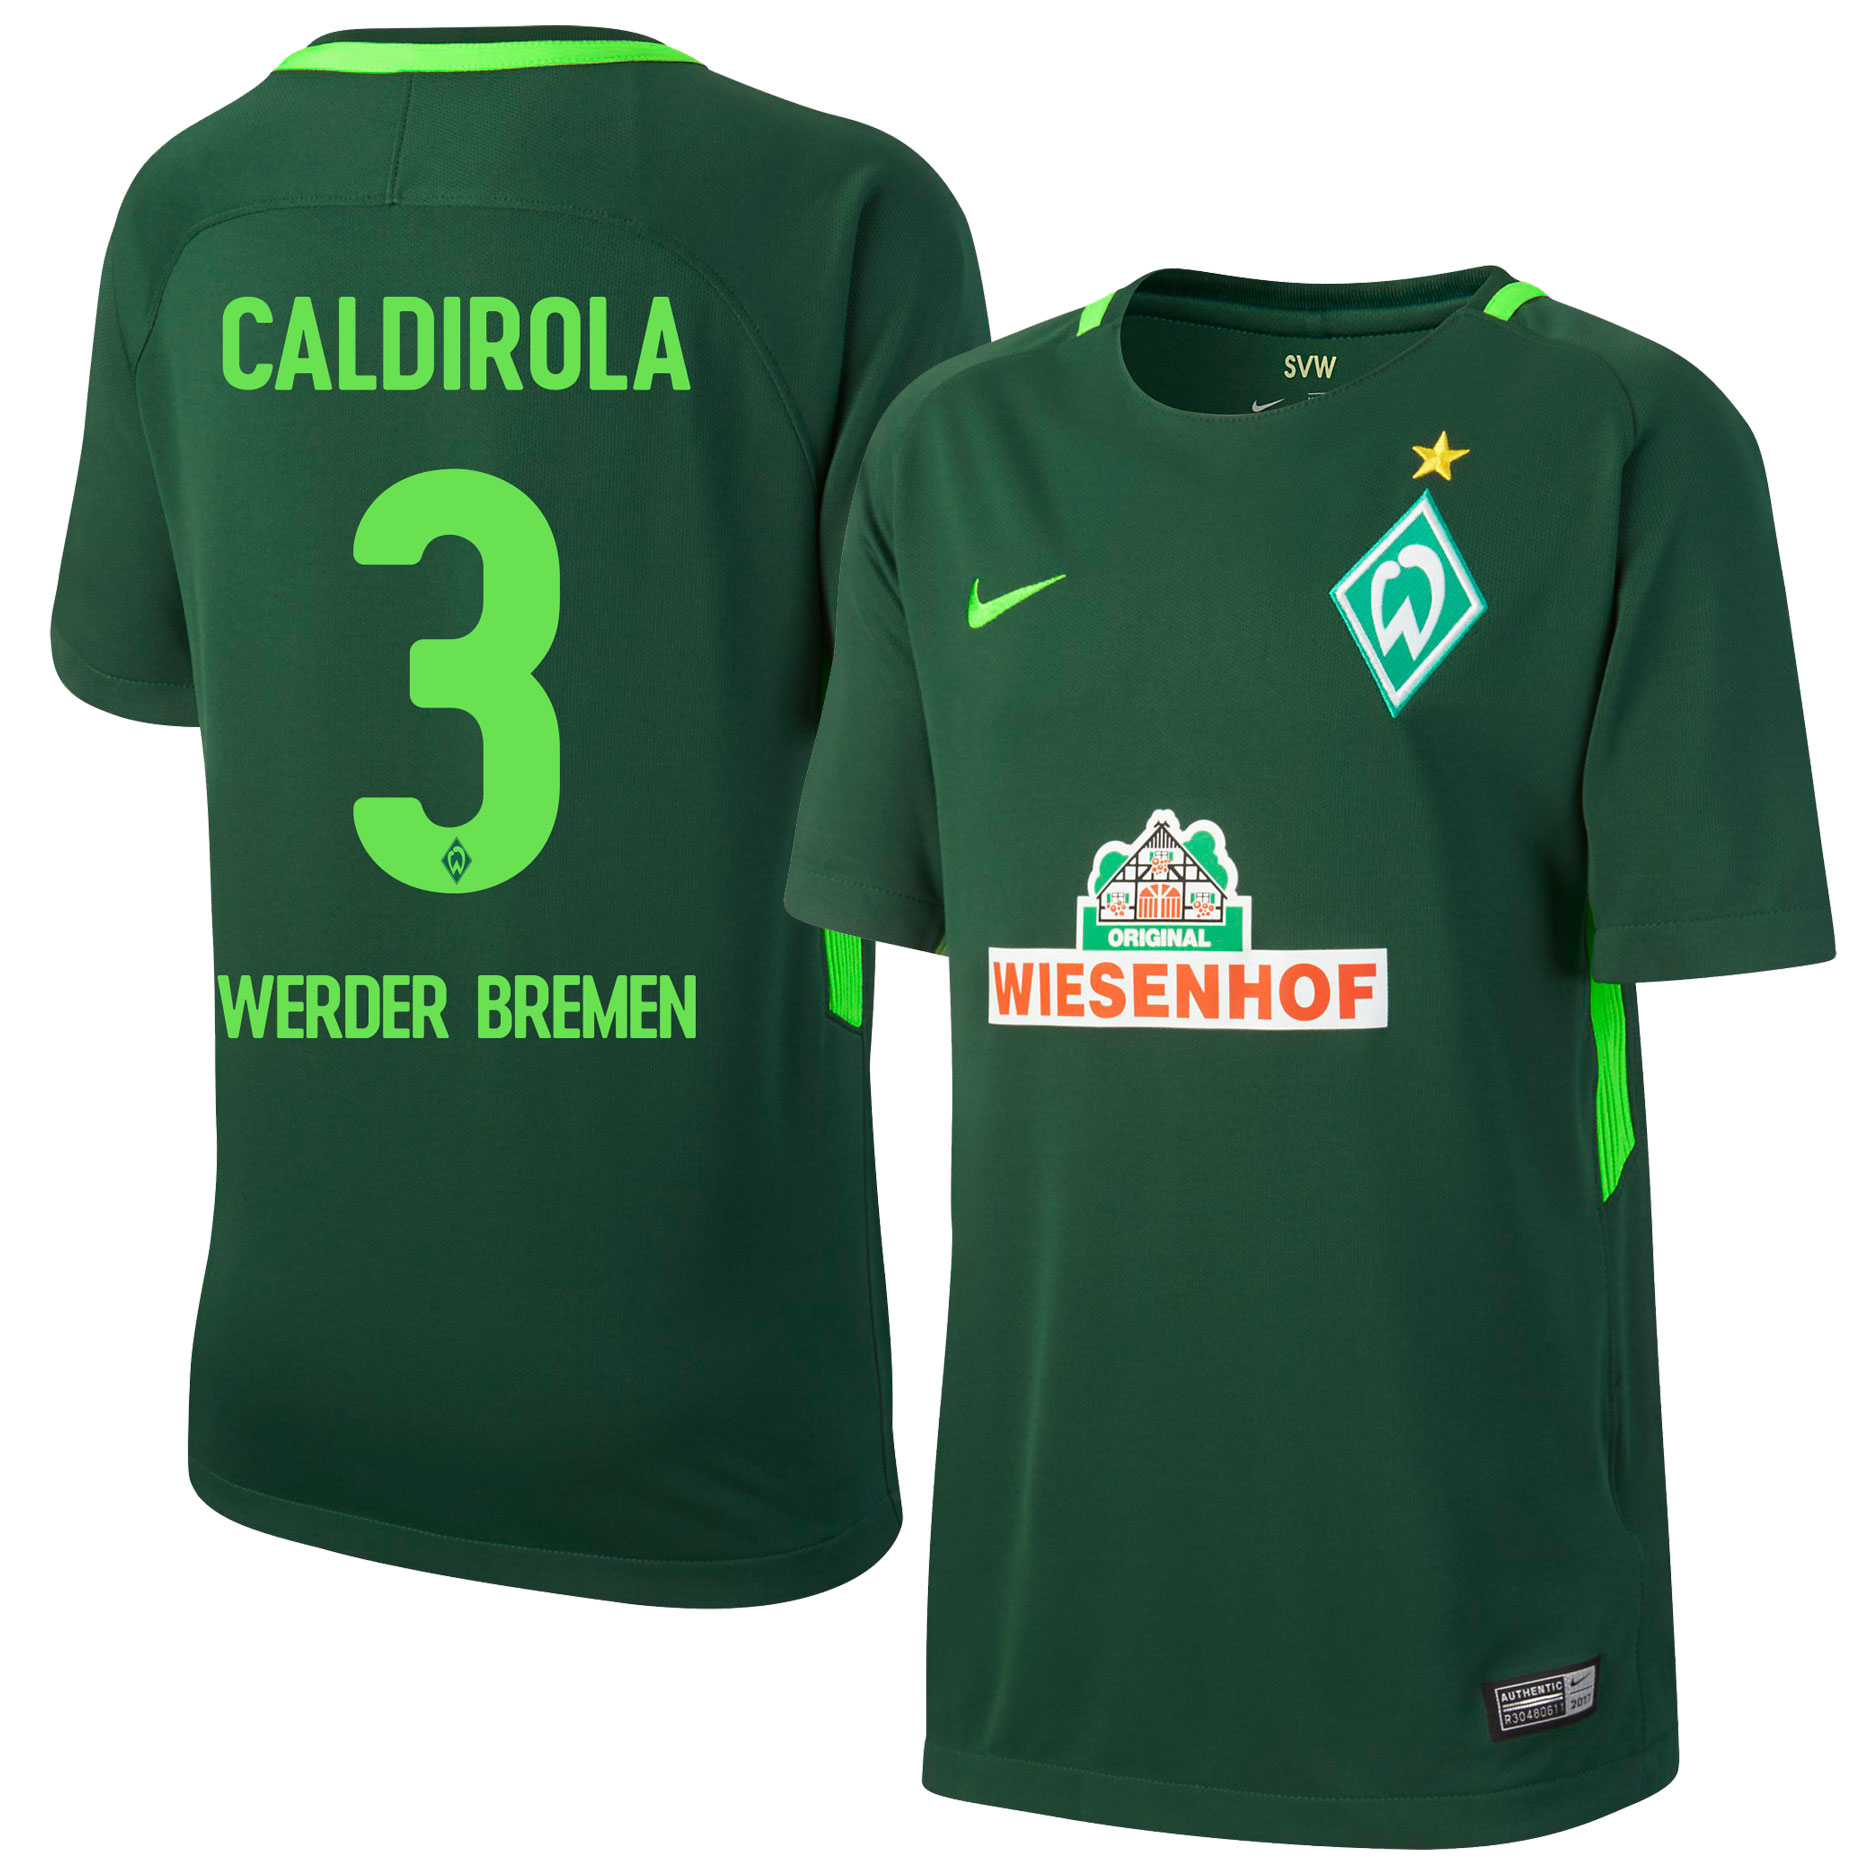 Werder Bremen Home Caldirola Jersey 2017 / 2018 (Official Printing) - L